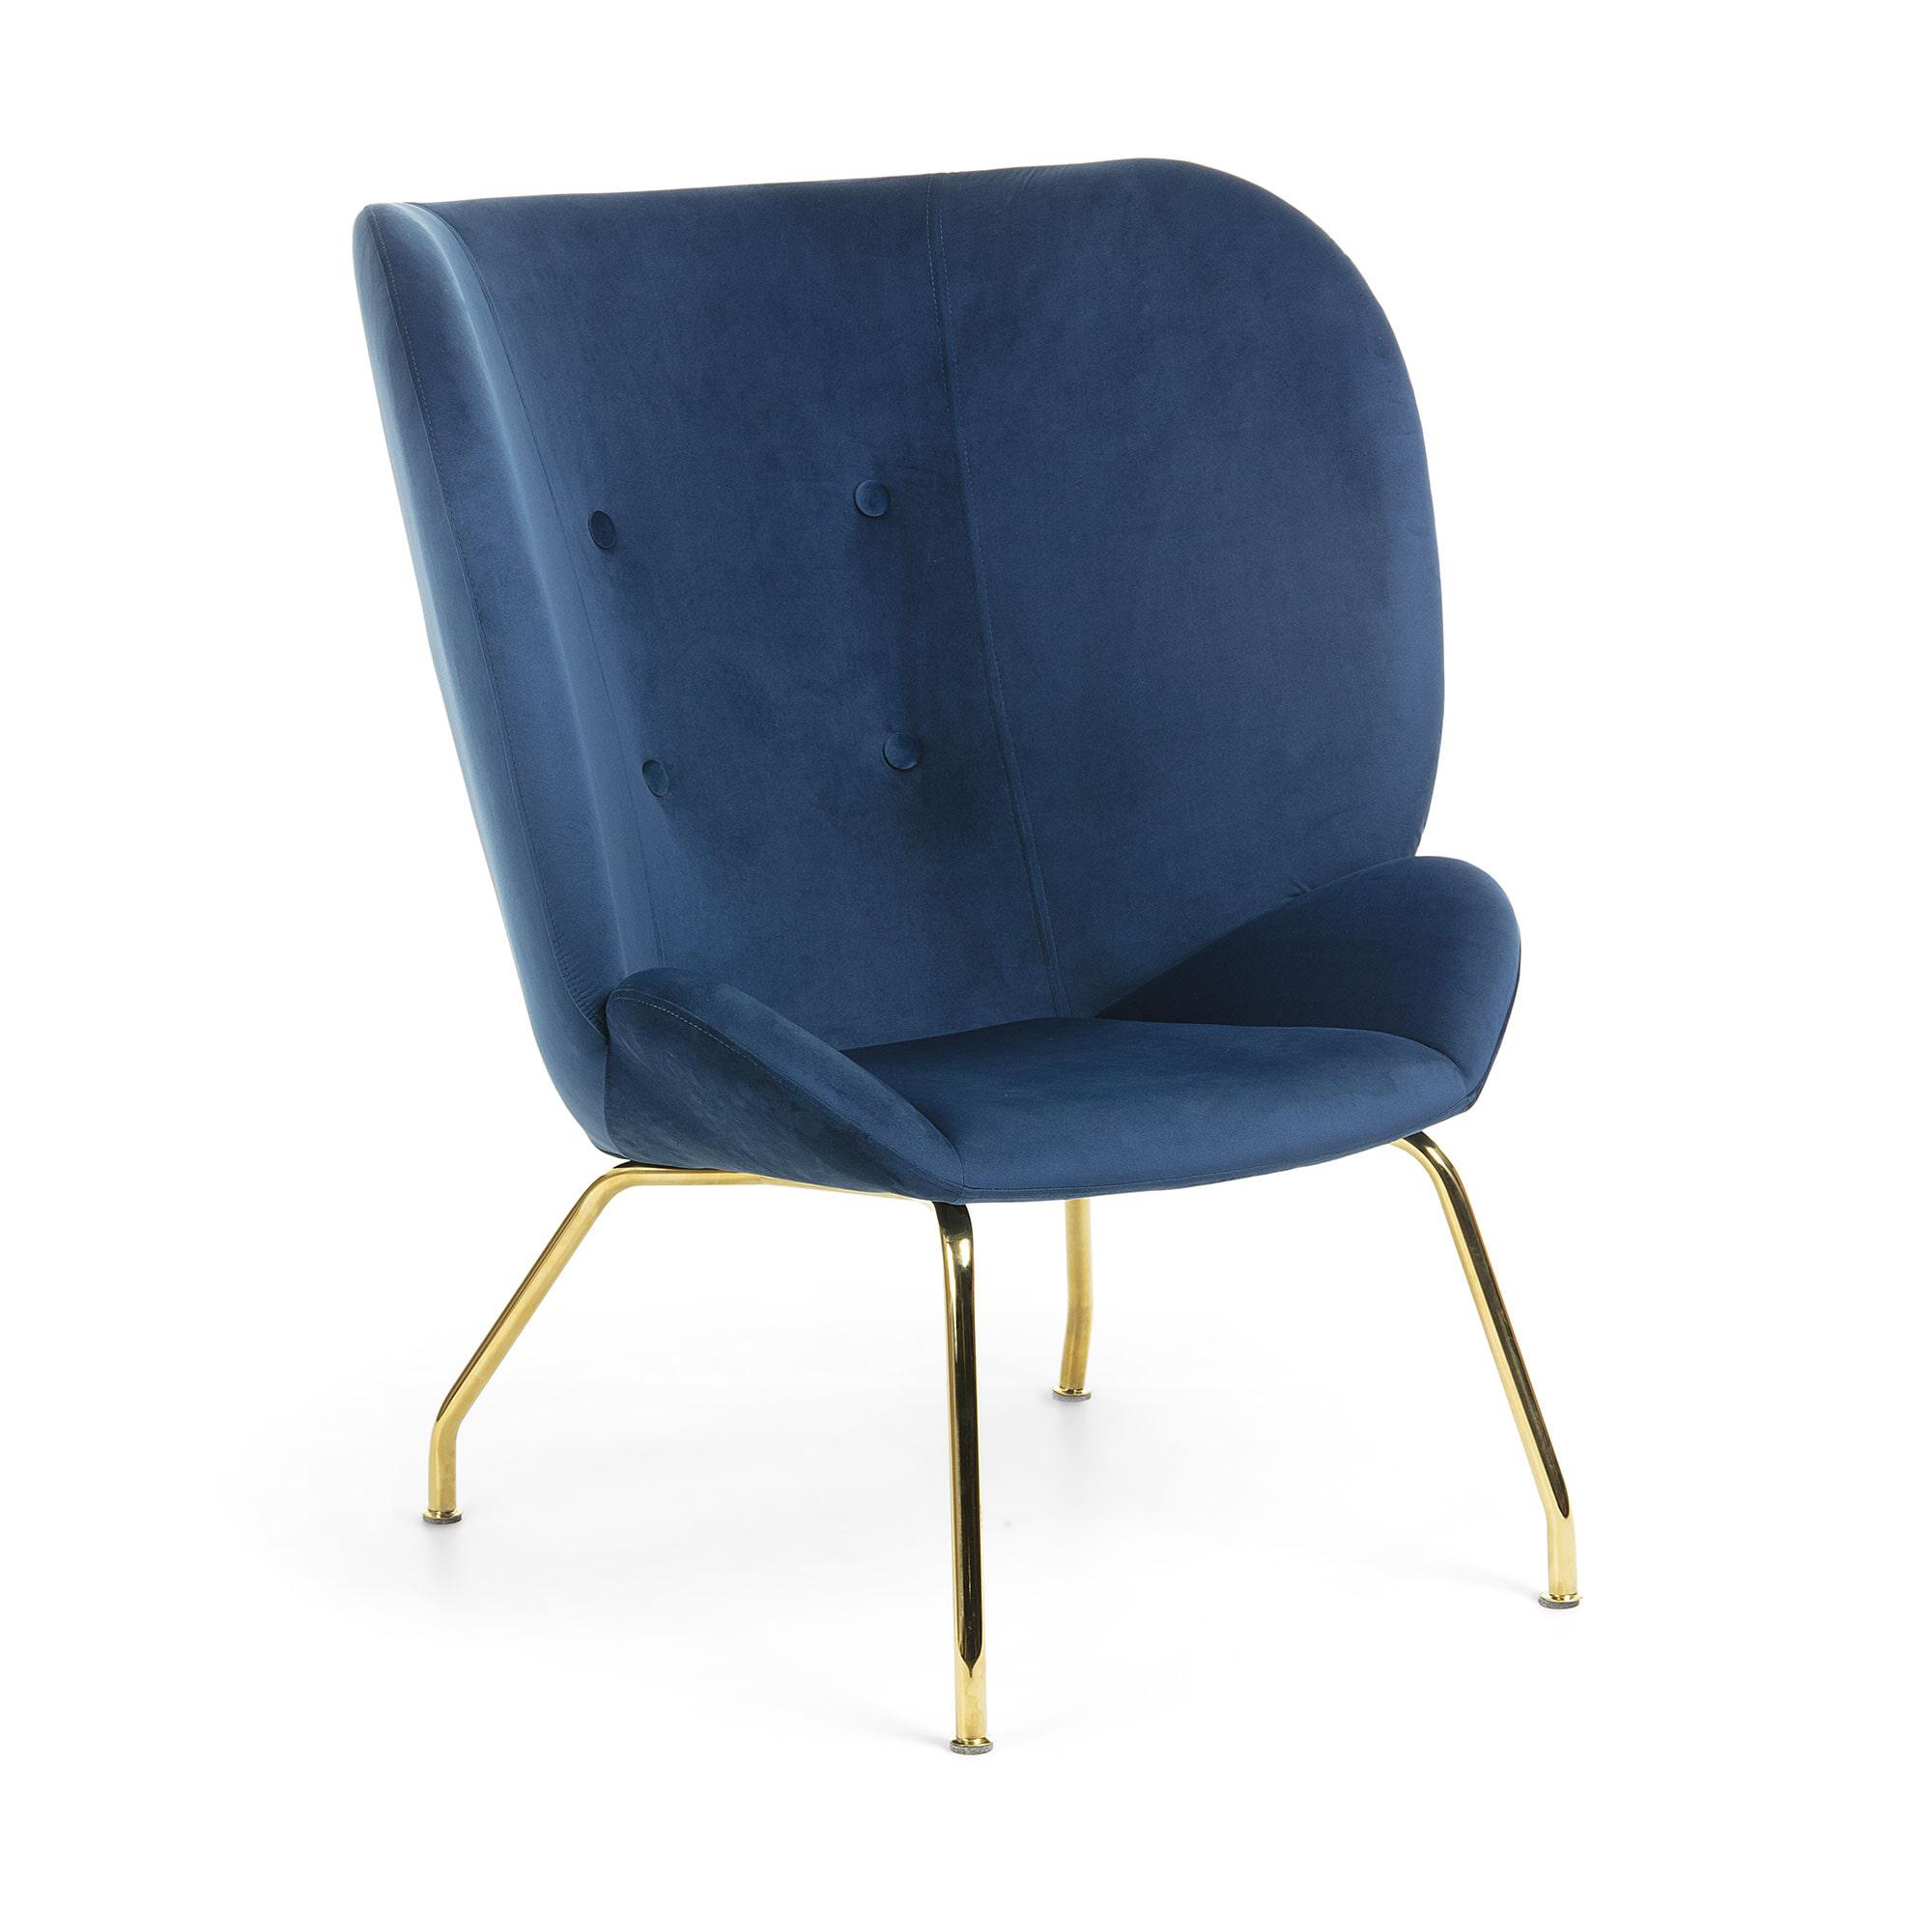 Kave Home Fauteuil 'Violet' Velvet, kleur Donkerblauw